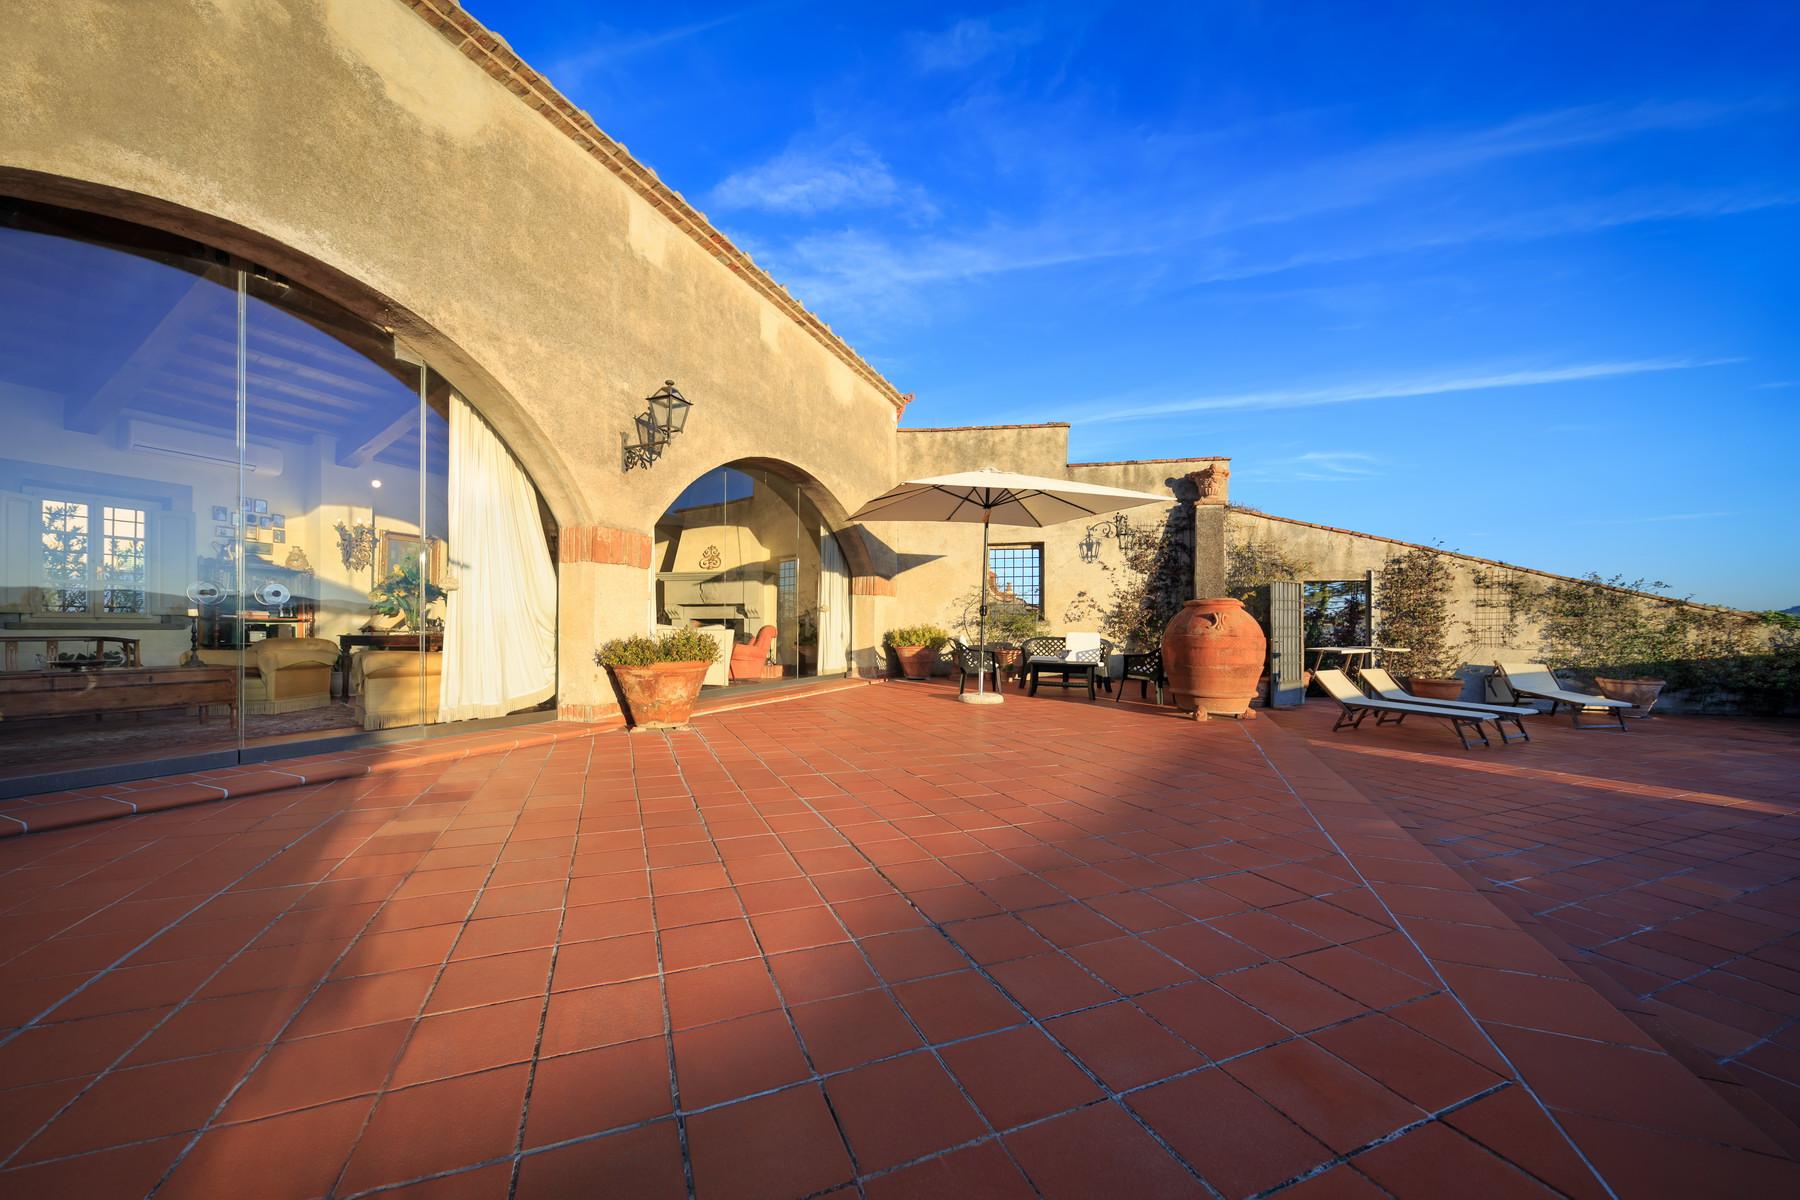 Villa in Vendita a Casciana Terme Lari: 5 locali, 550 mq - Foto 14